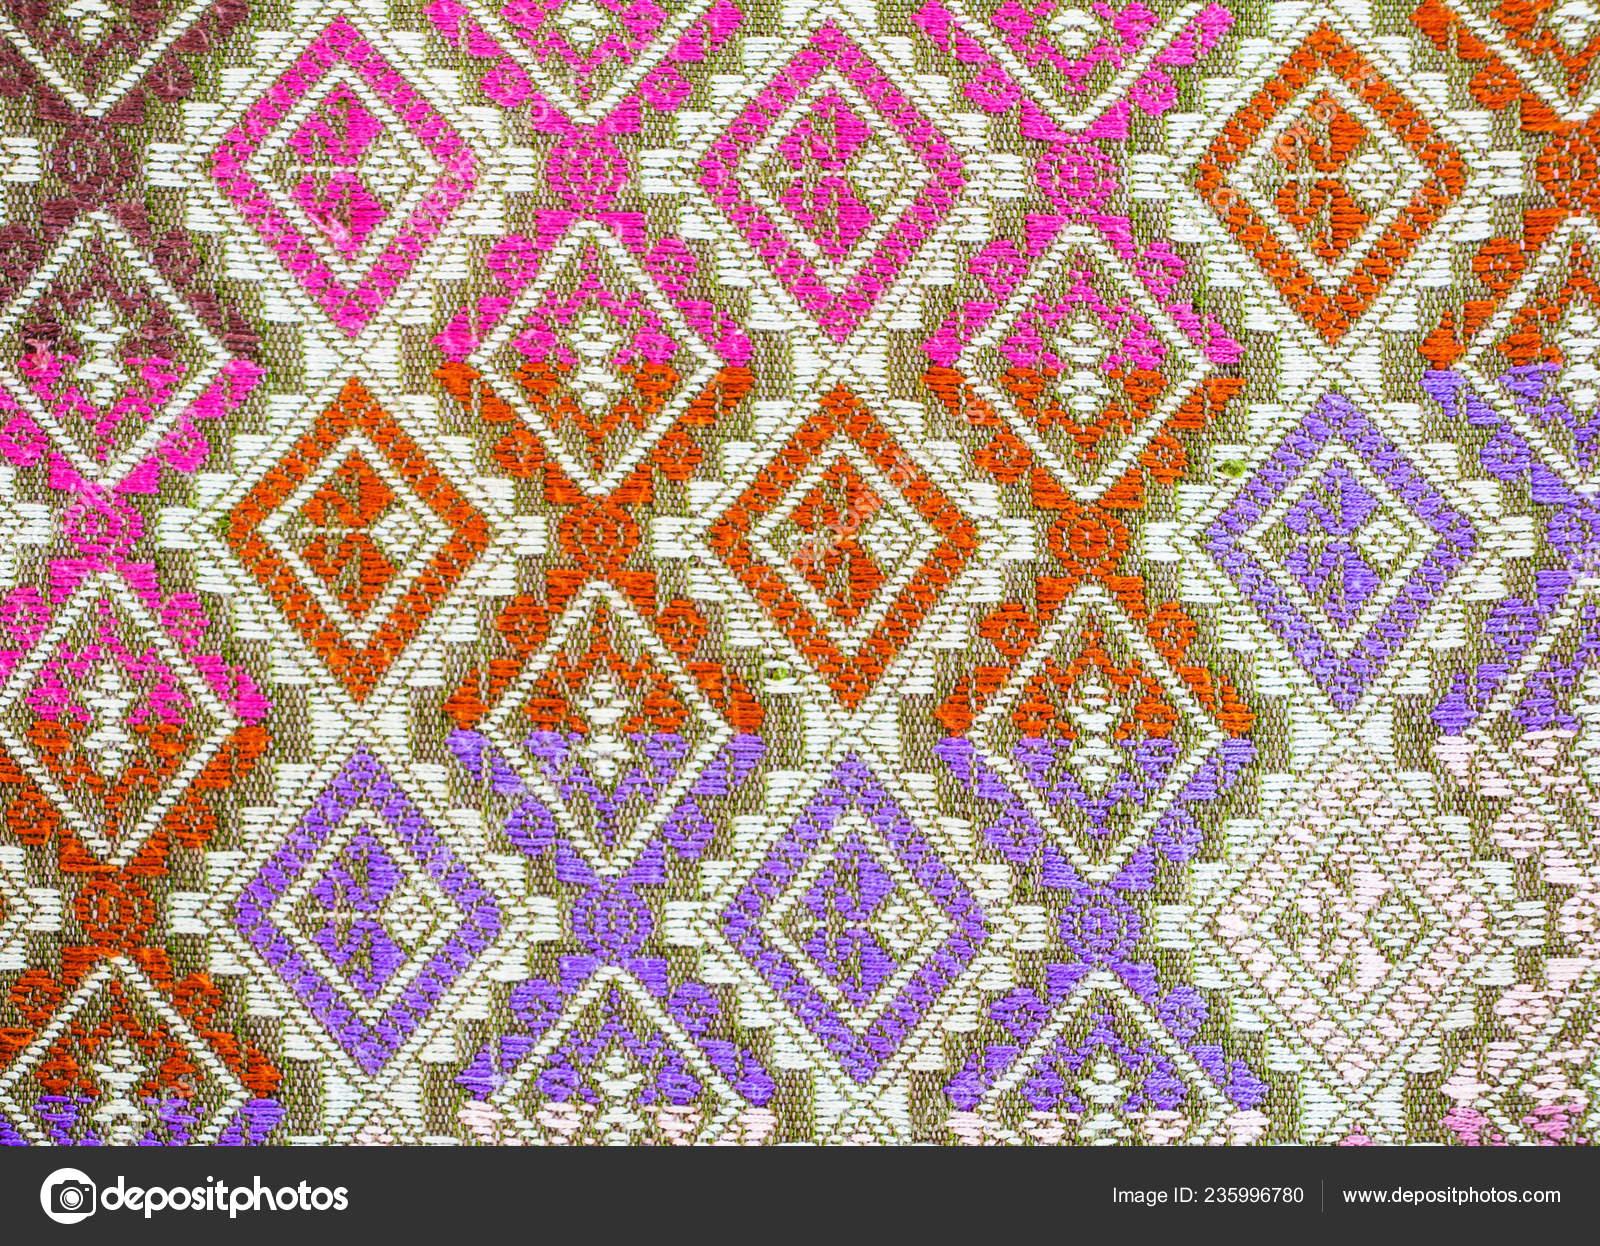 Embroidery Designs Patterns Thai Fabrics Patterns Thai Graphic Thailand Embroidery Designs